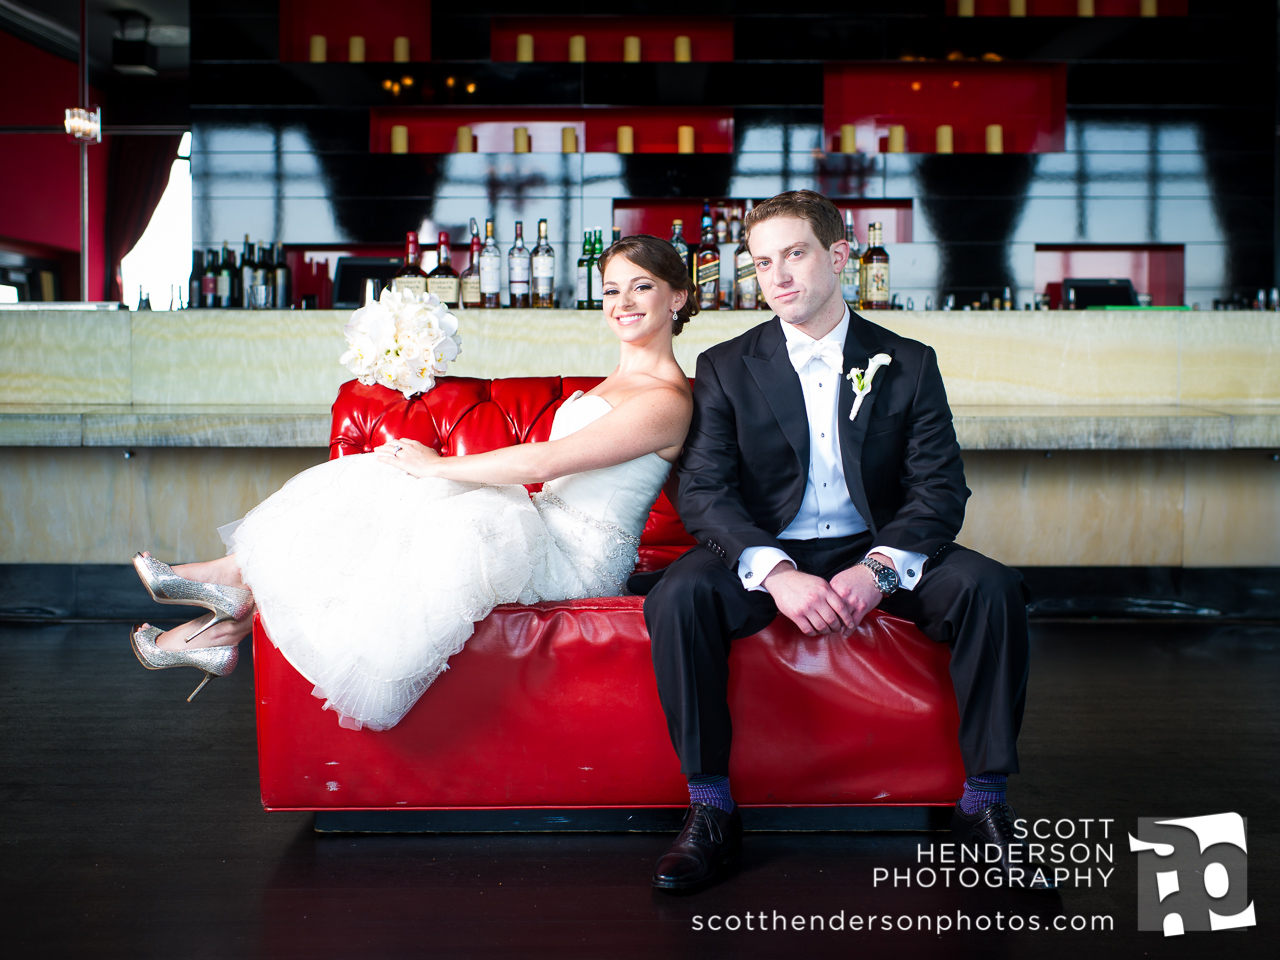 yearinreview-wedding-011.jpg